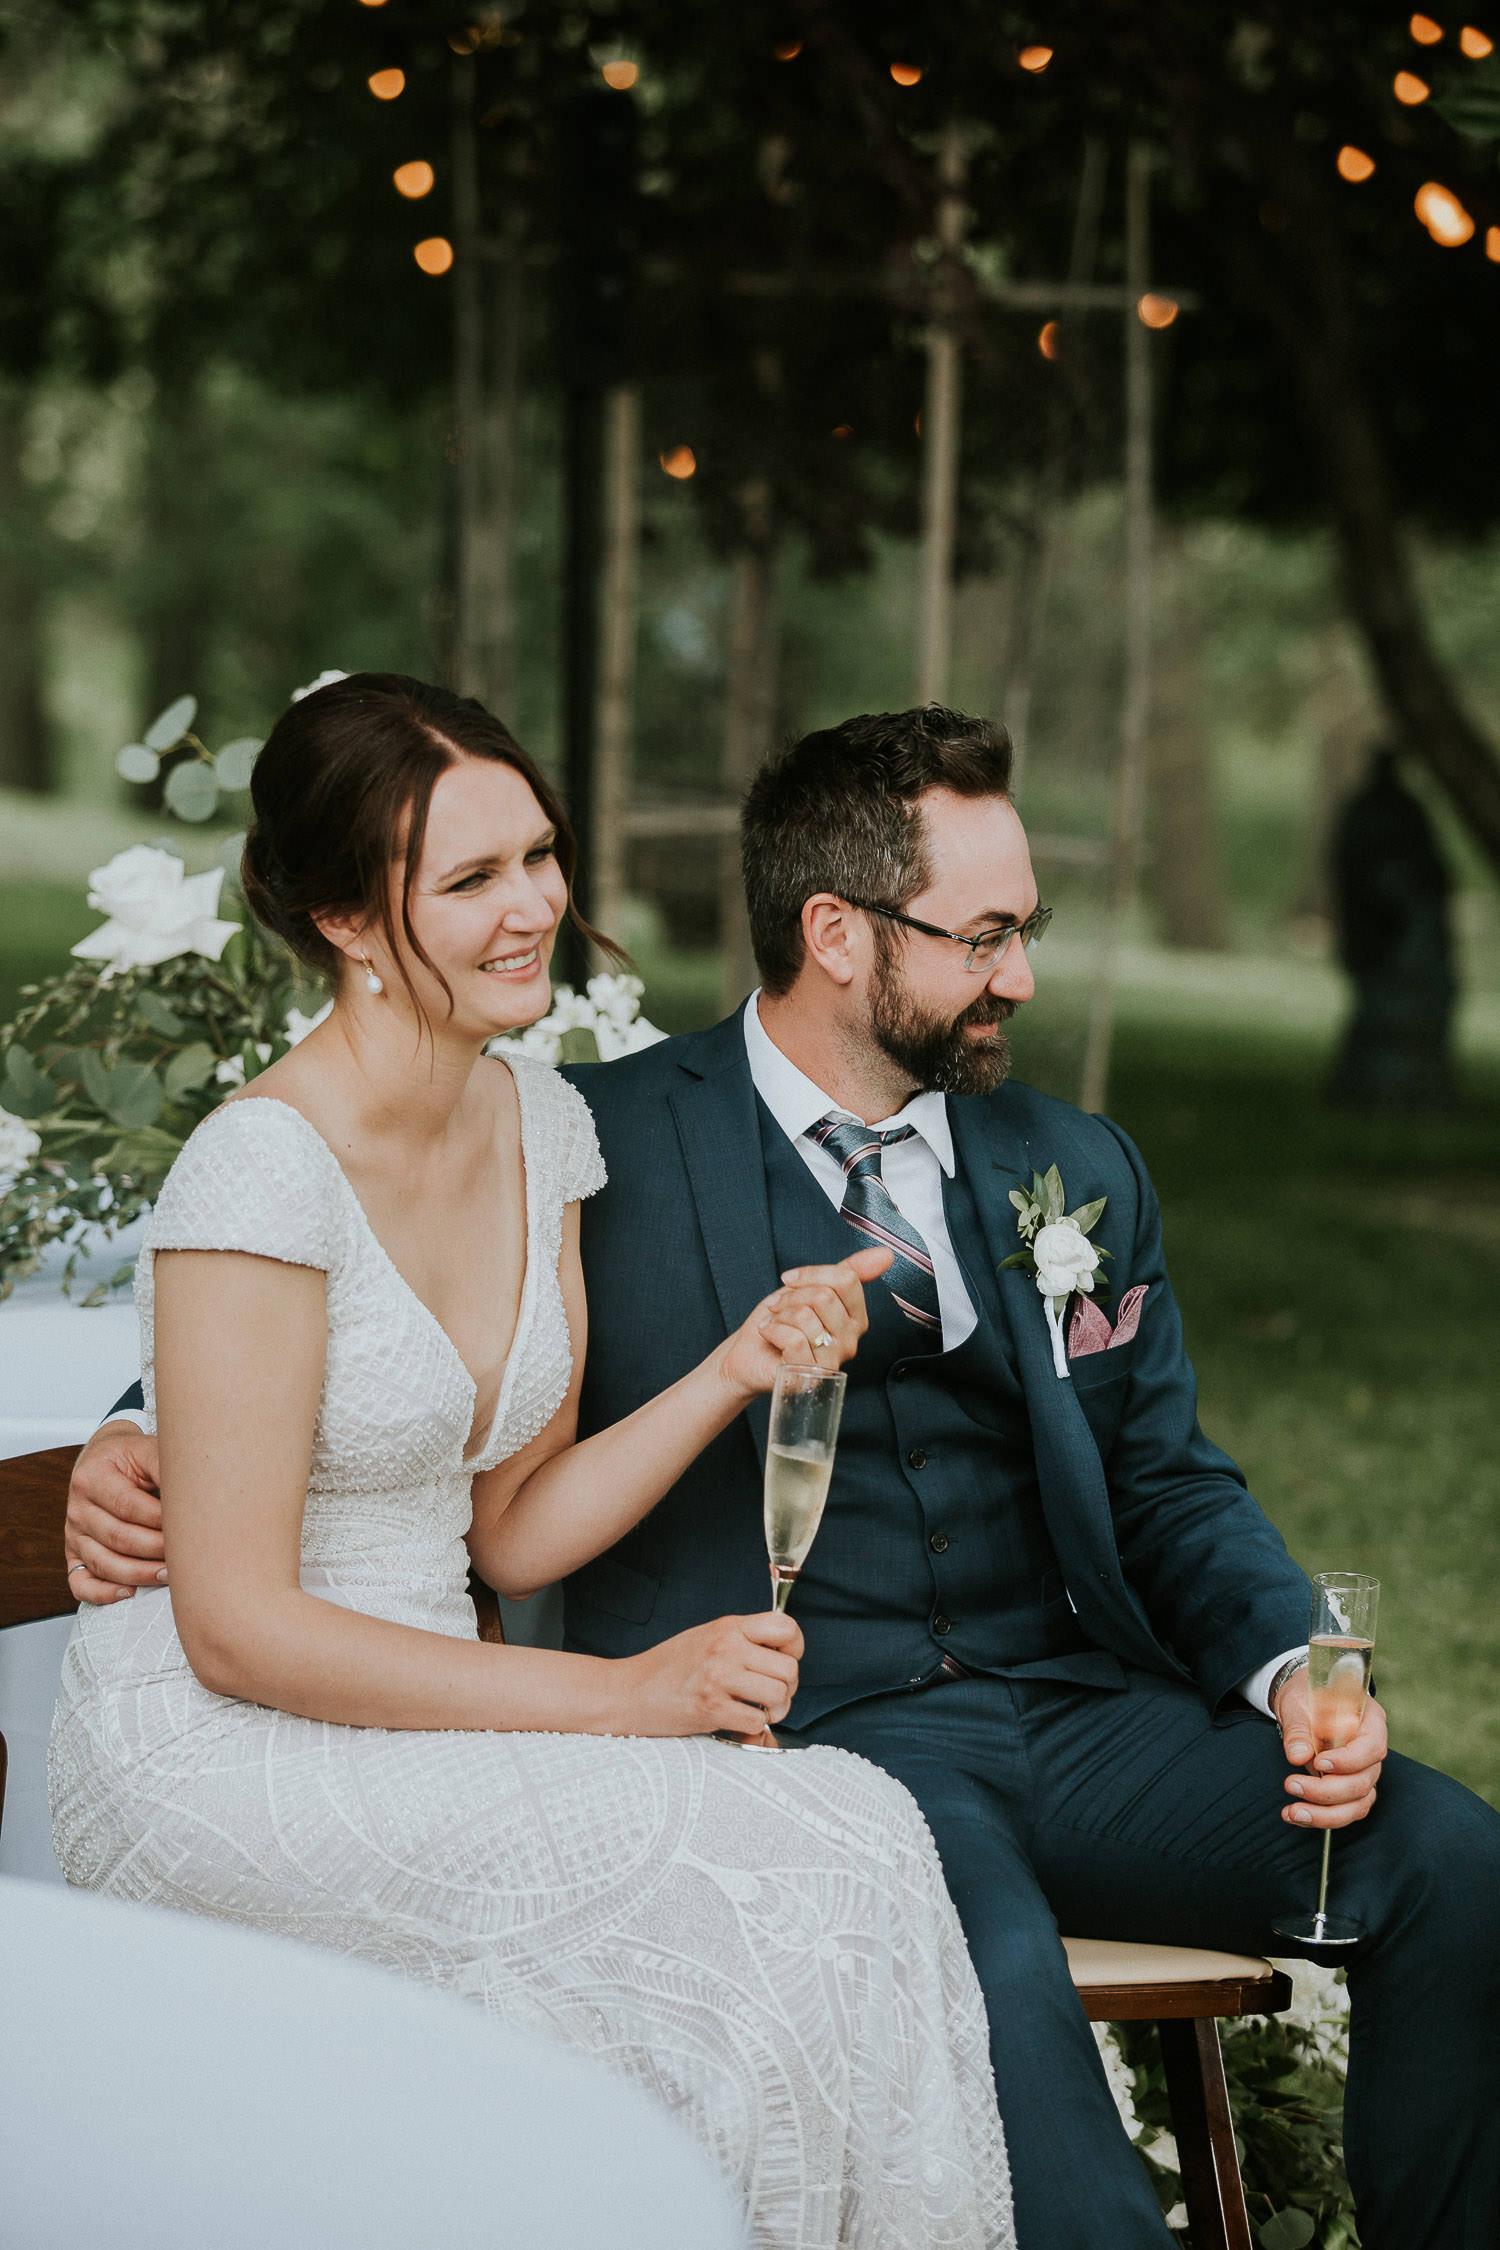 summer-backyard-wedding-in-alberta-sarah-pukin-0147